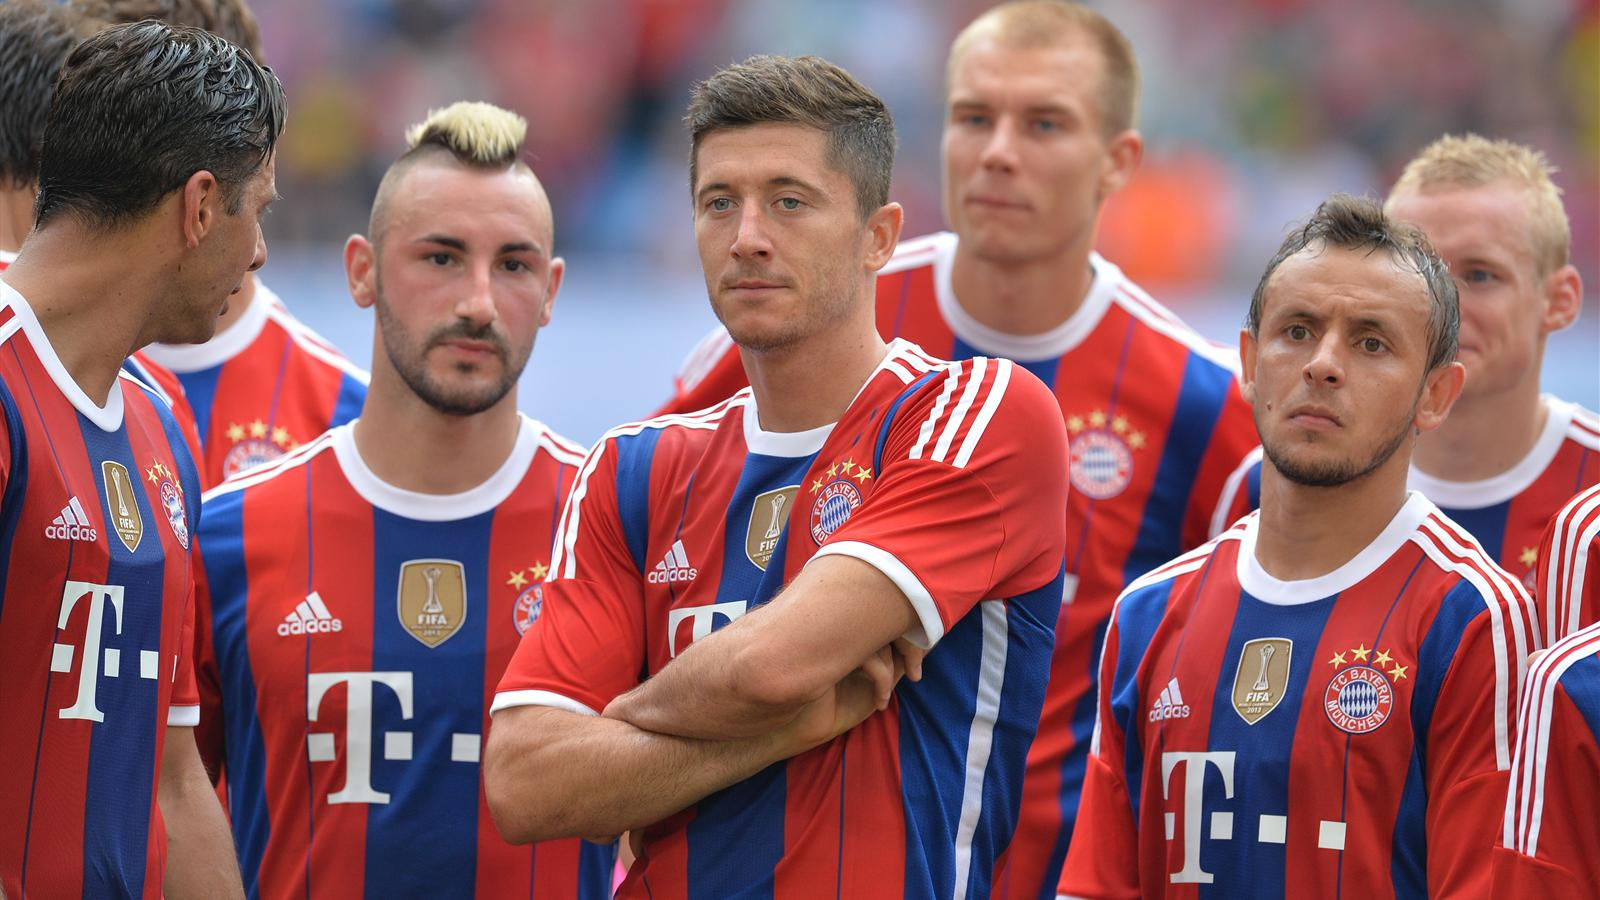 Robert Lewandowski avec le Bayern Munich lors de la Telekom Cup 2014